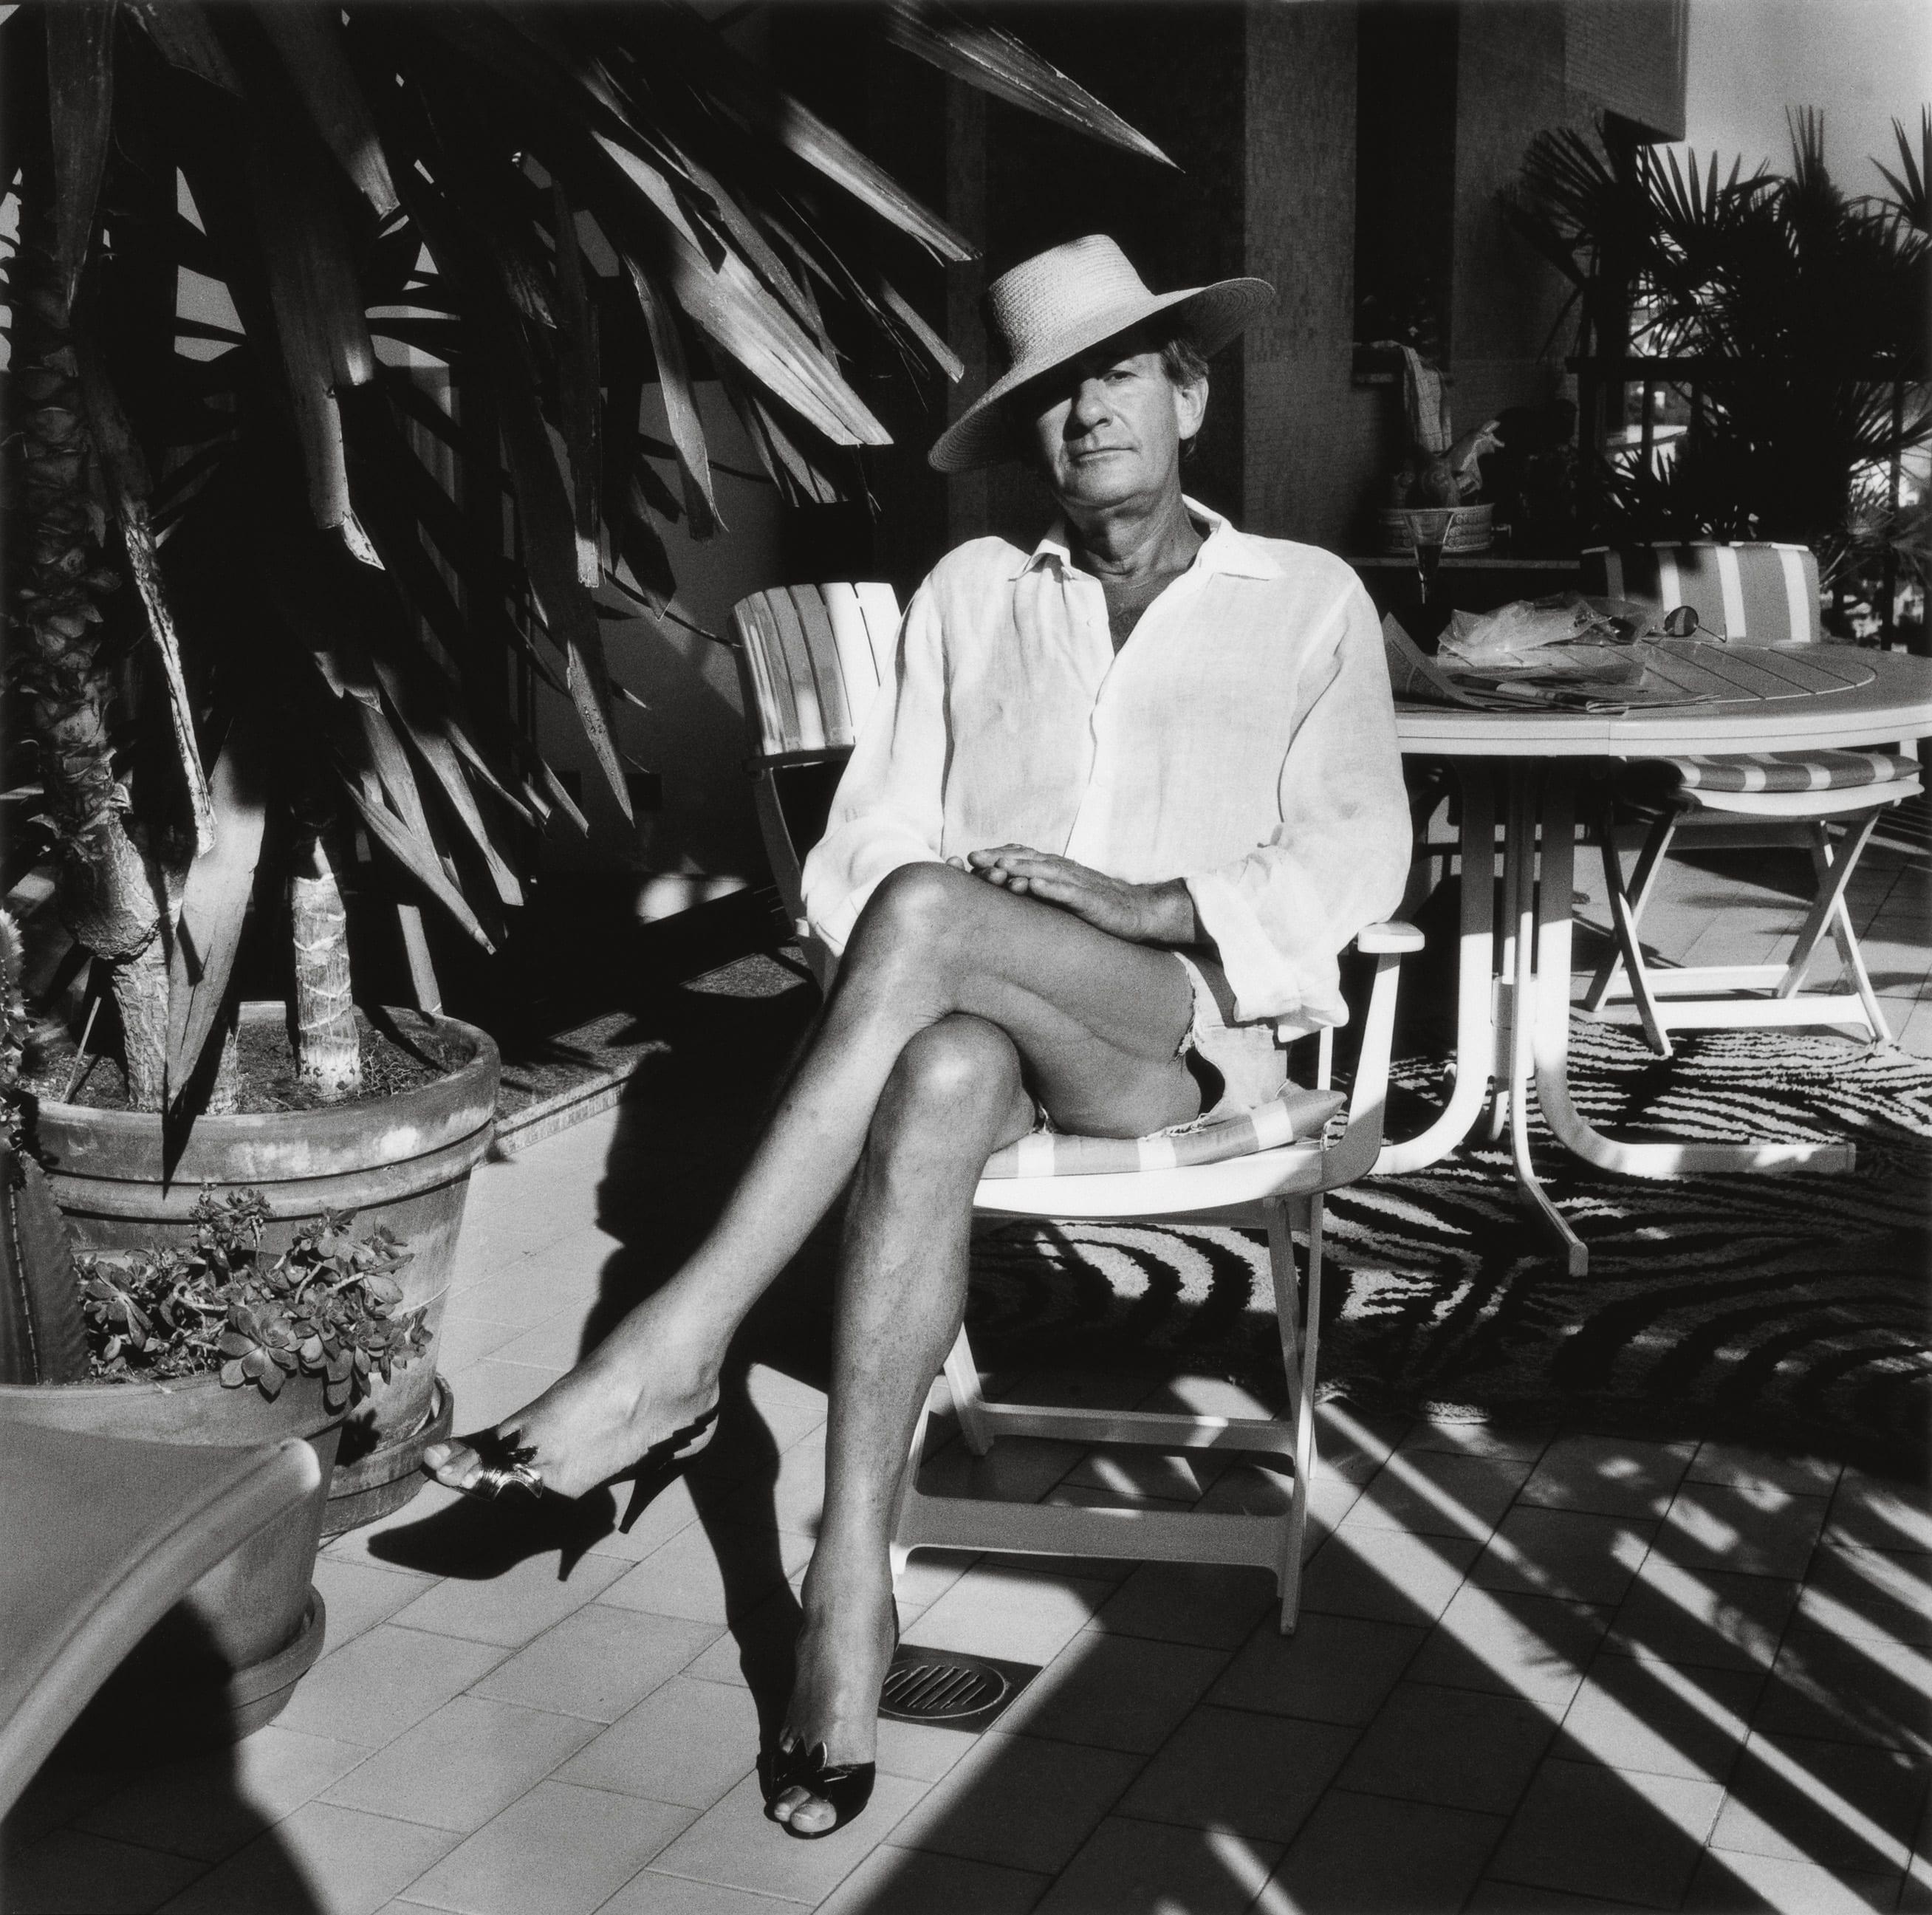 helmut newton and alice springs intimate self portraits. Black Bedroom Furniture Sets. Home Design Ideas